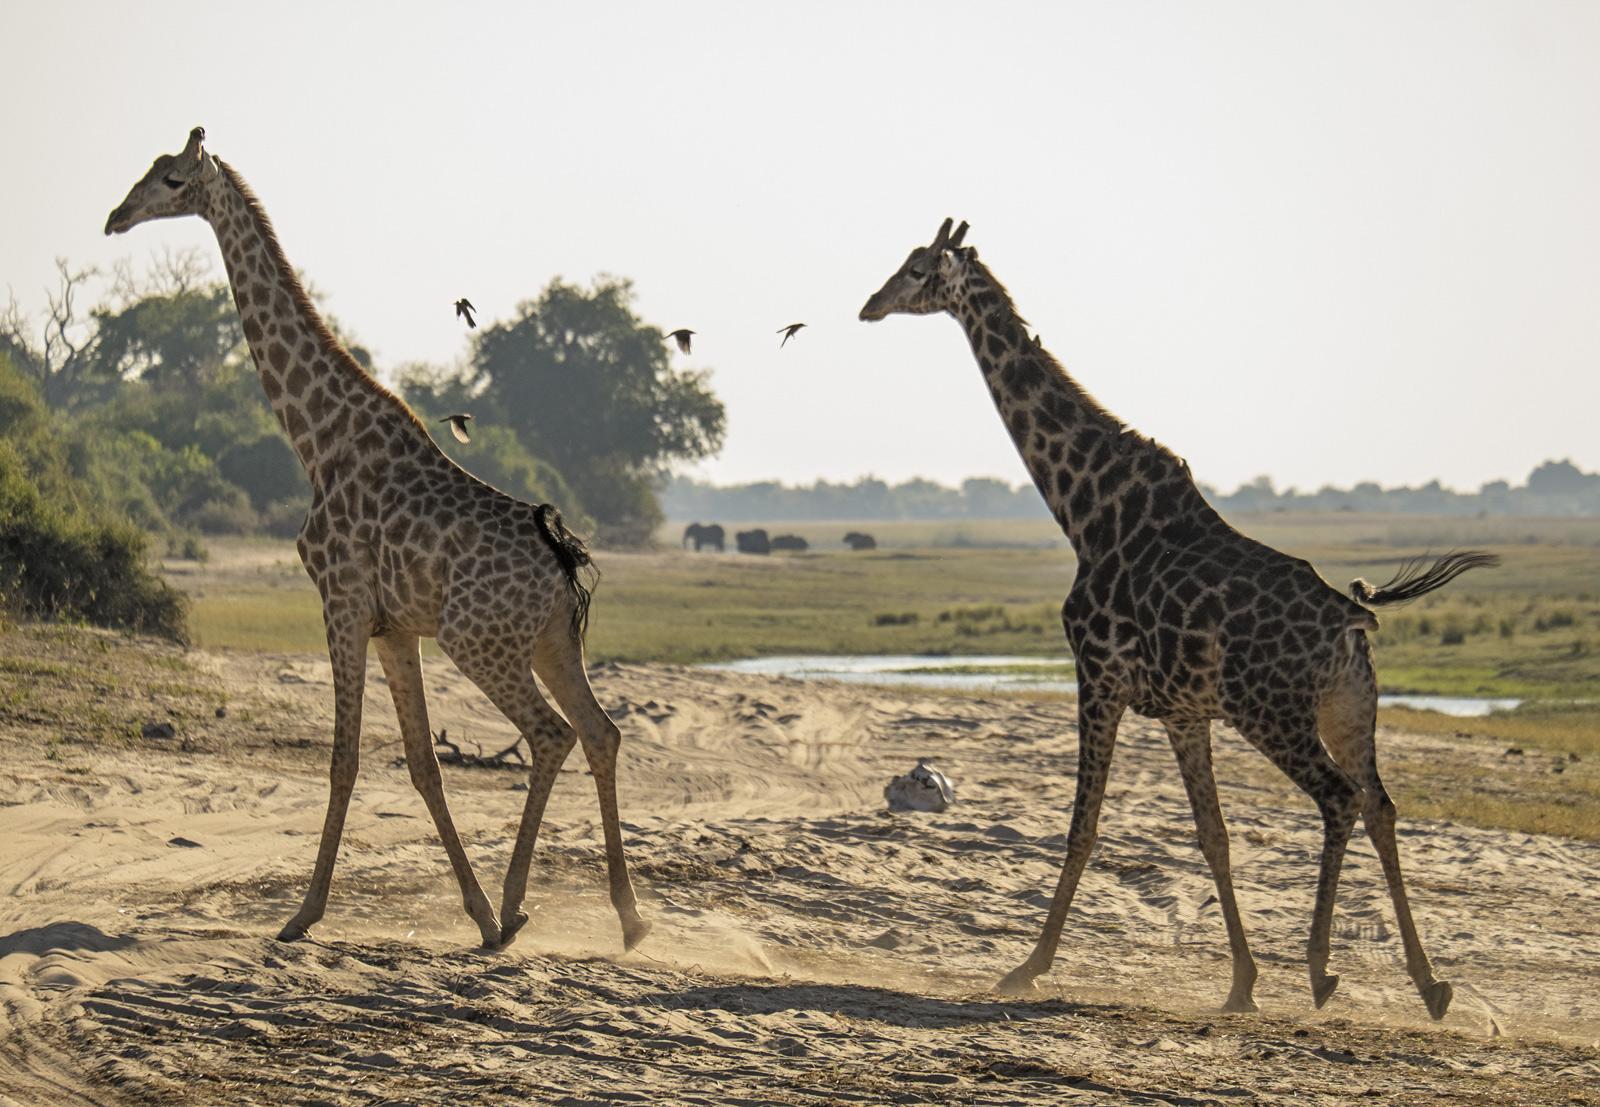 Chobe Giraffe, Chobe, Botswana, Africa, giraffe, elegant, favourites, cantering, gigantic, strides, oxpecker, elephant, , photo